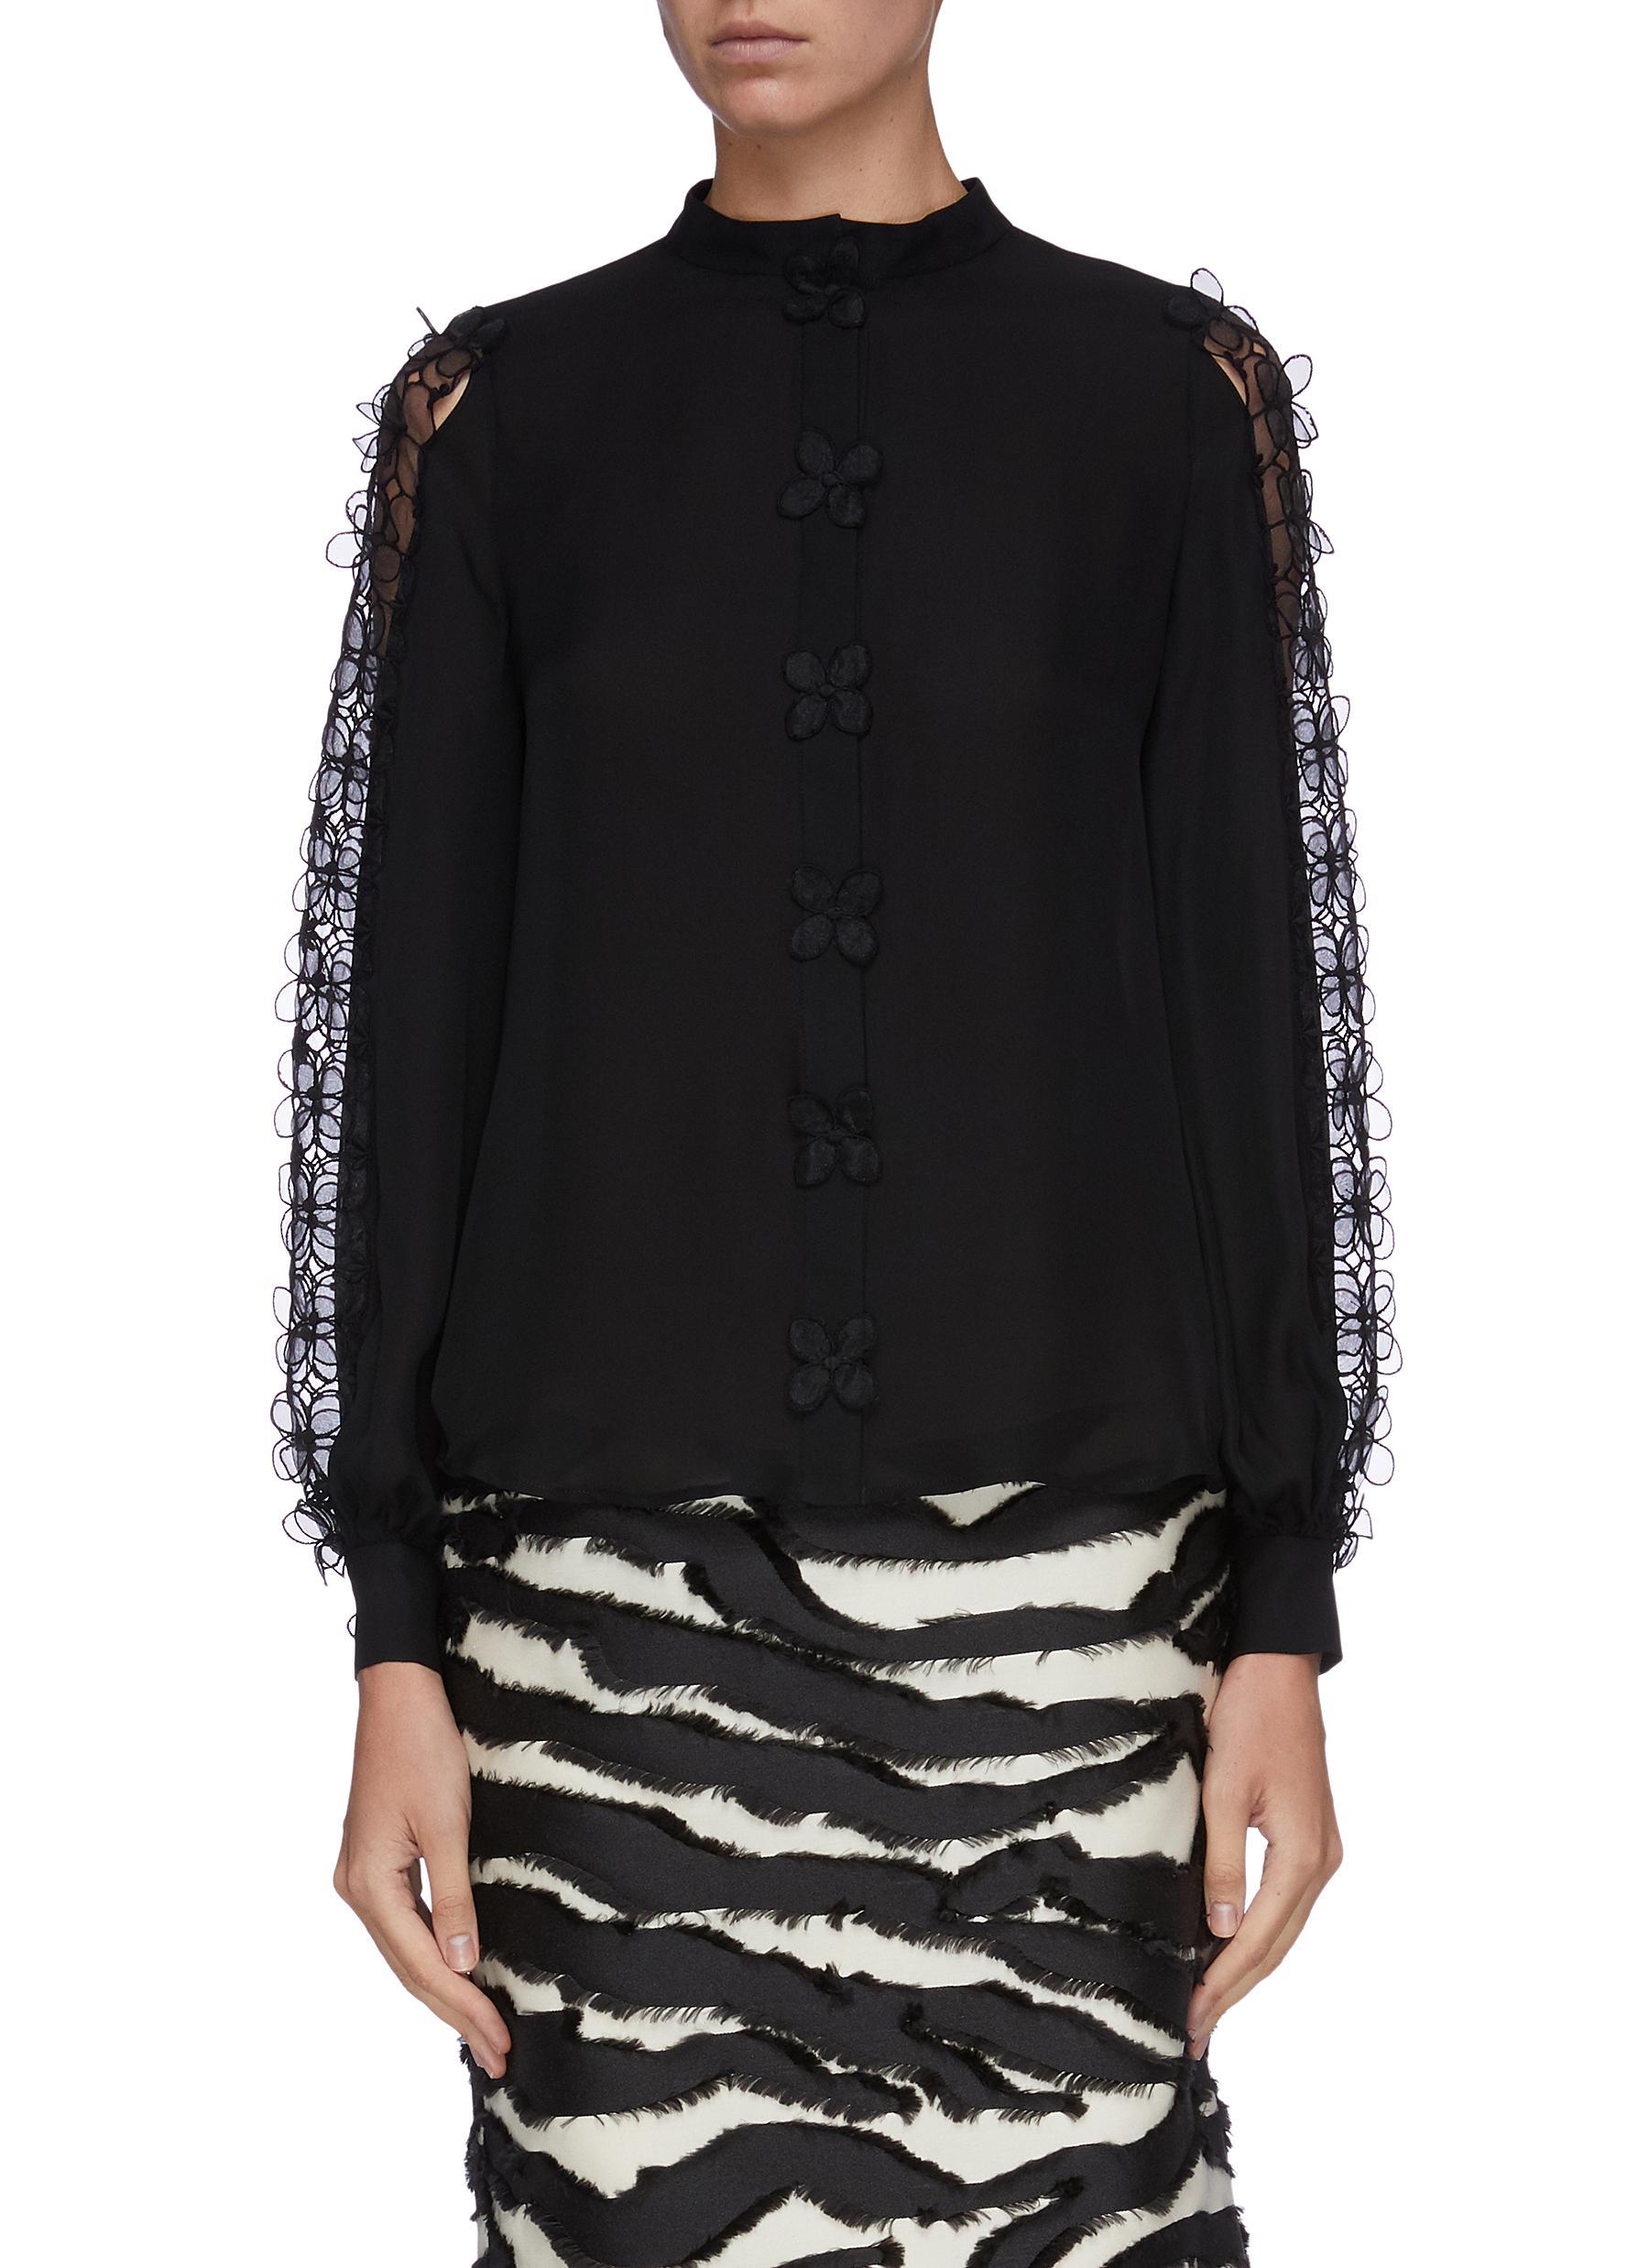 Floral appliqué sleeve silk georgette blouse by Oscar De La Renta